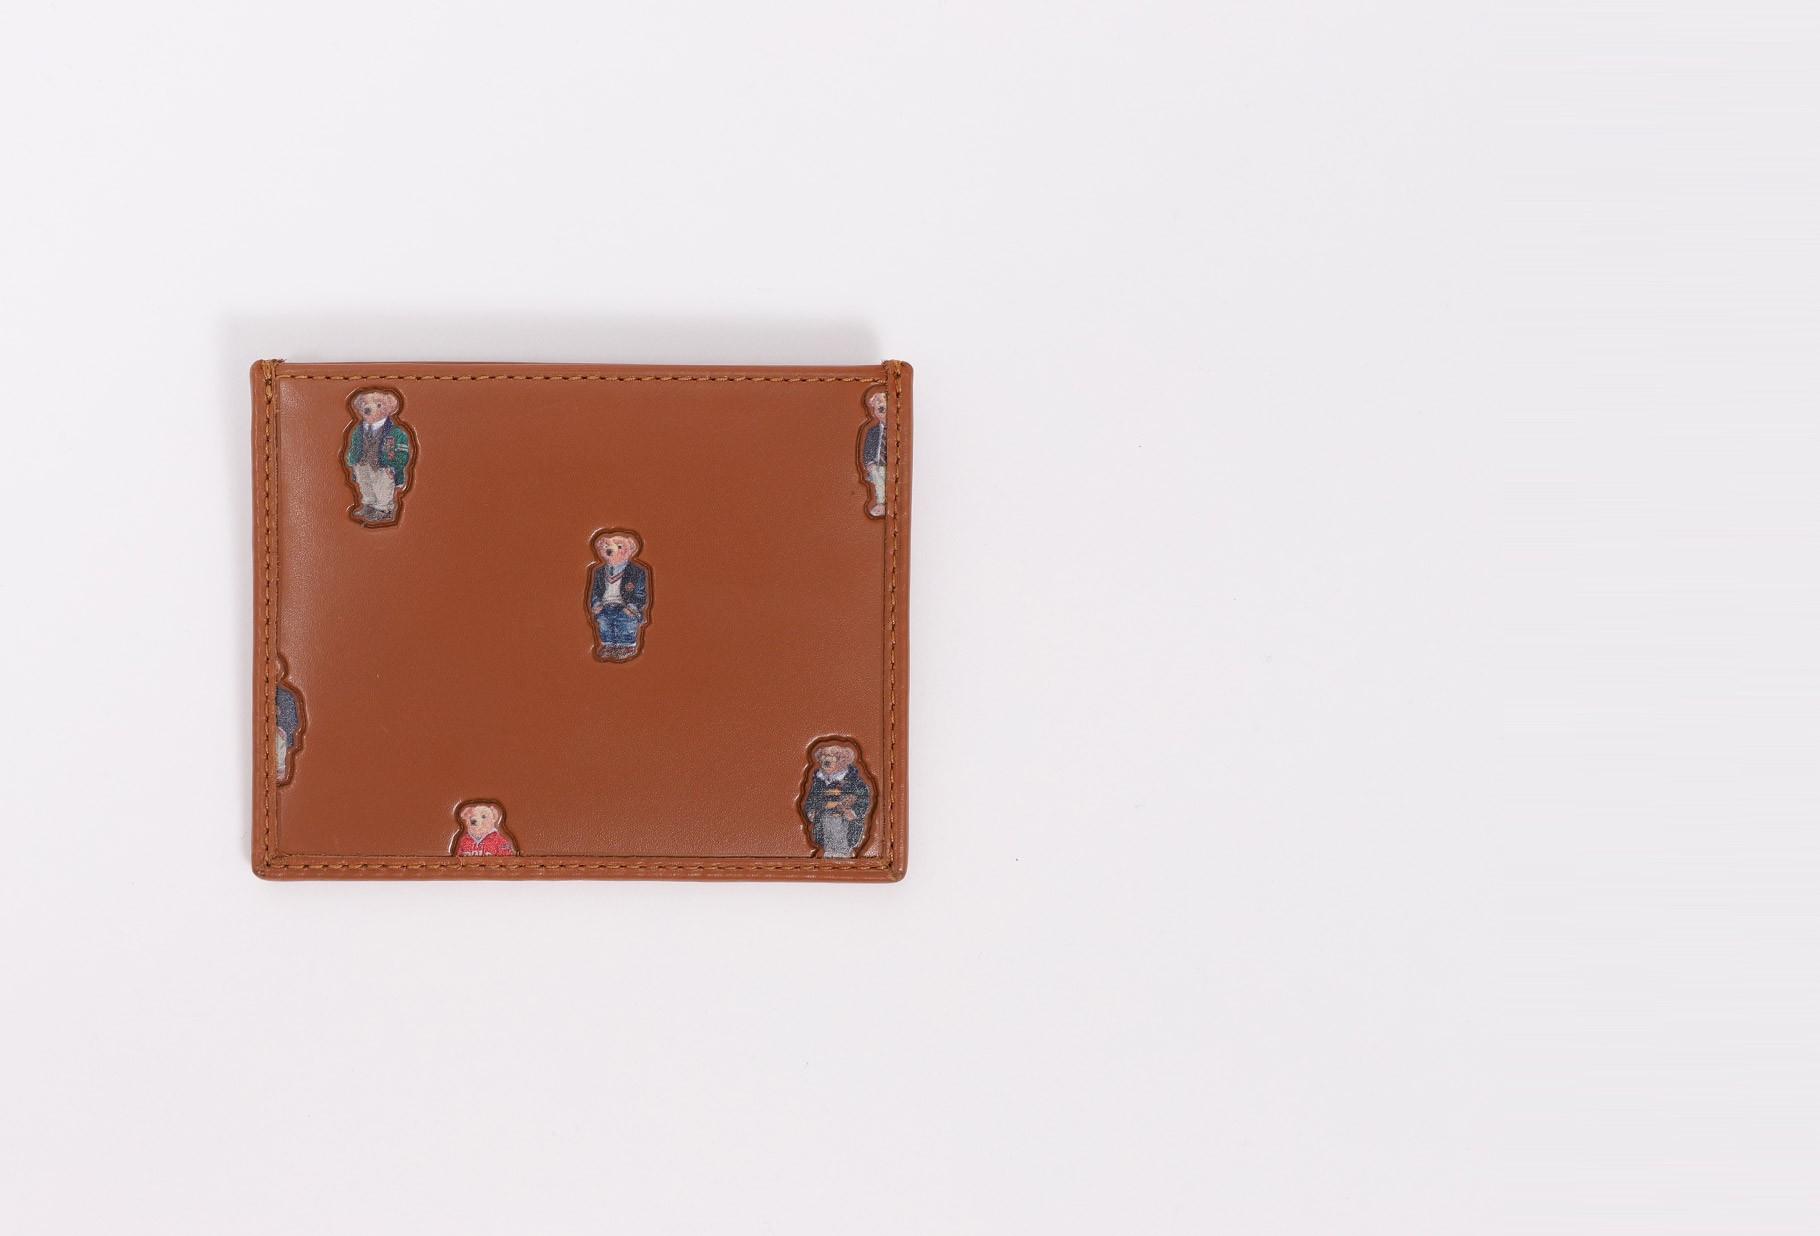 POLO RALPH LAUREN / Polo bear card case leather Tan